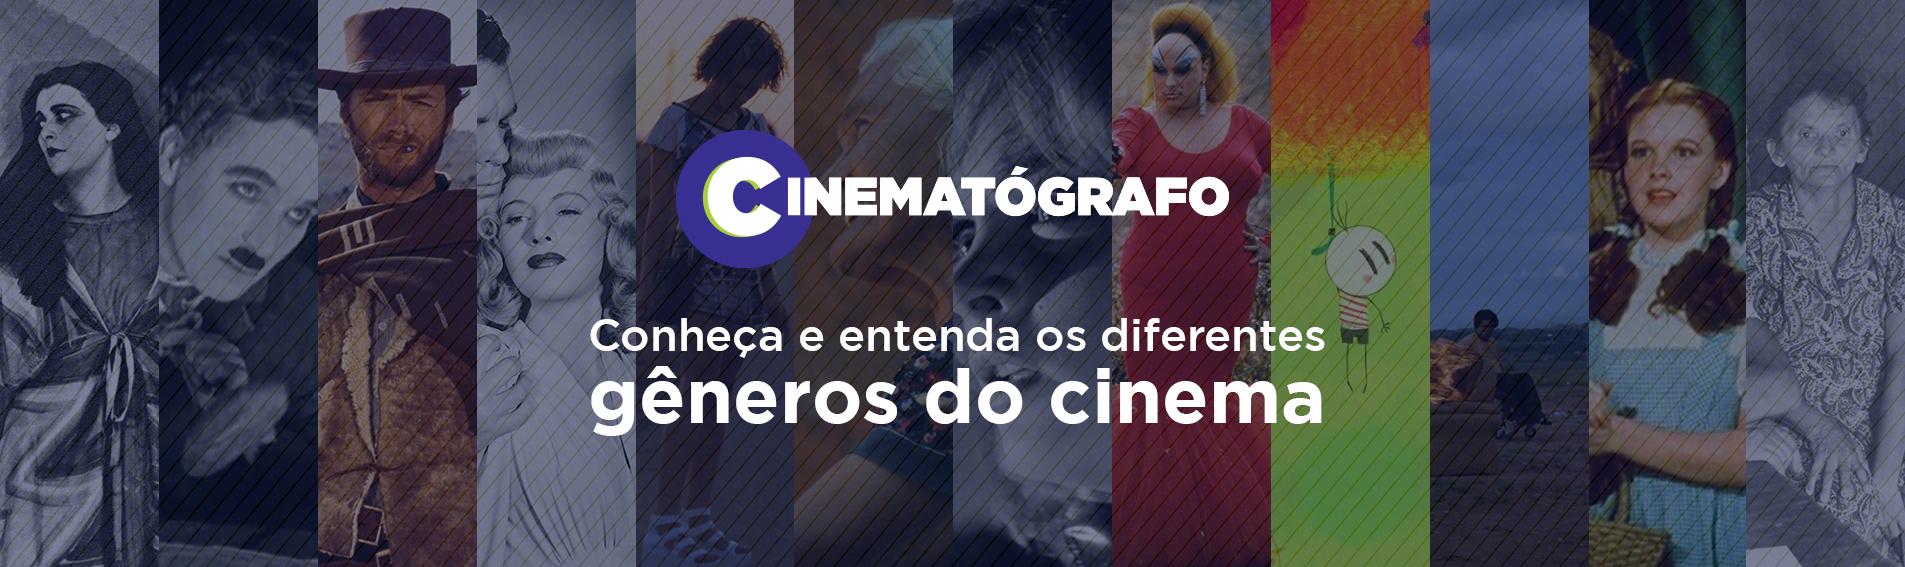 banner_cinematografo_pagina_generosdocinema